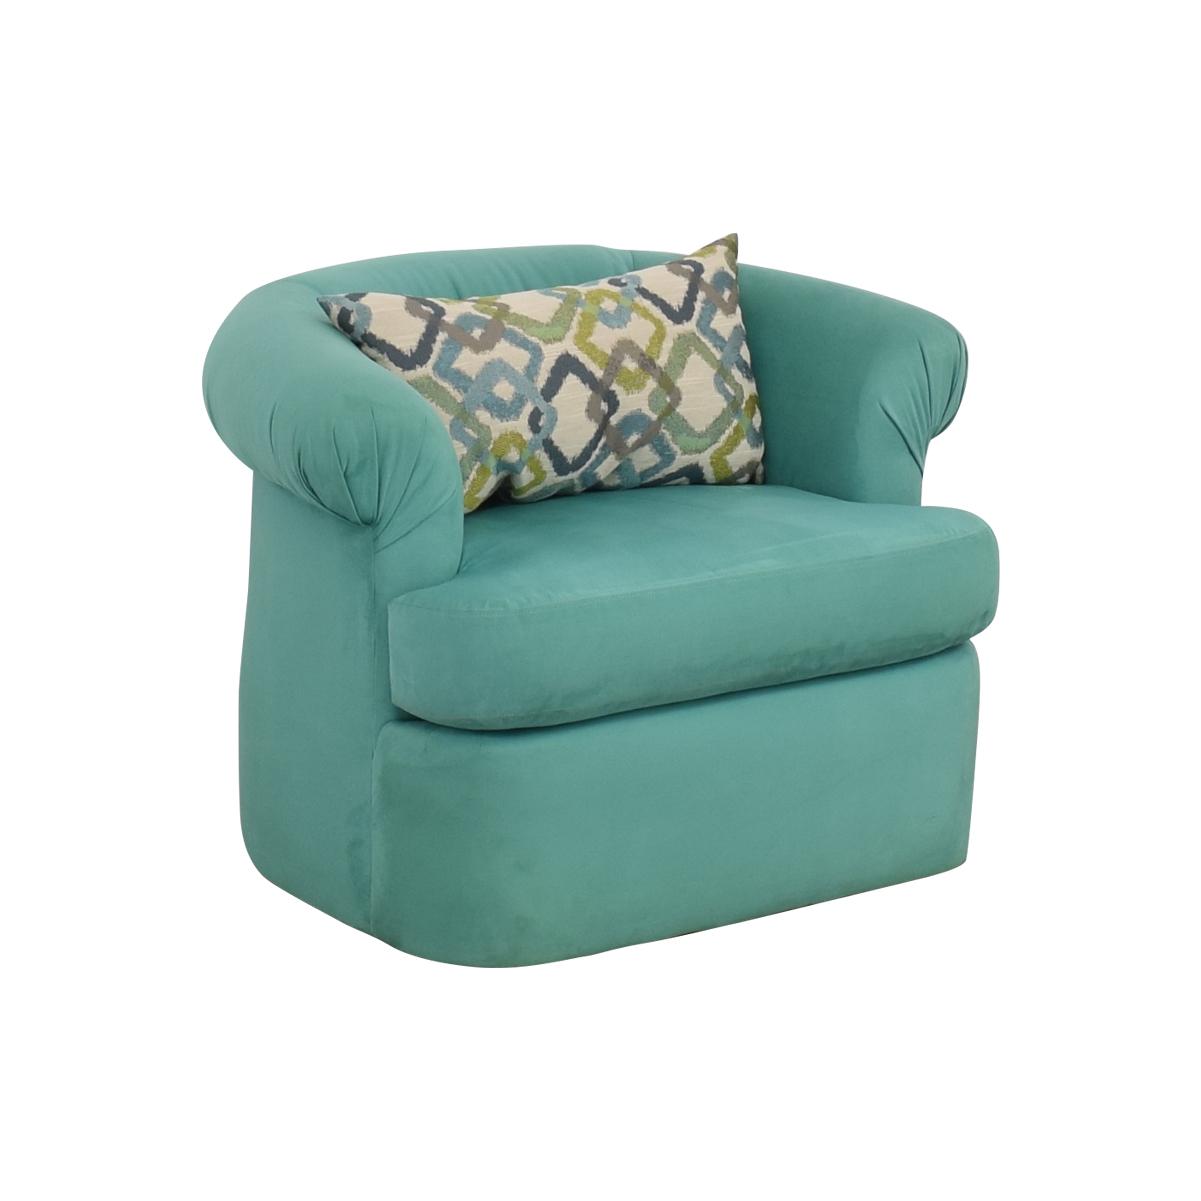 Directional Furniture Directional Furniture Suede Chair discount